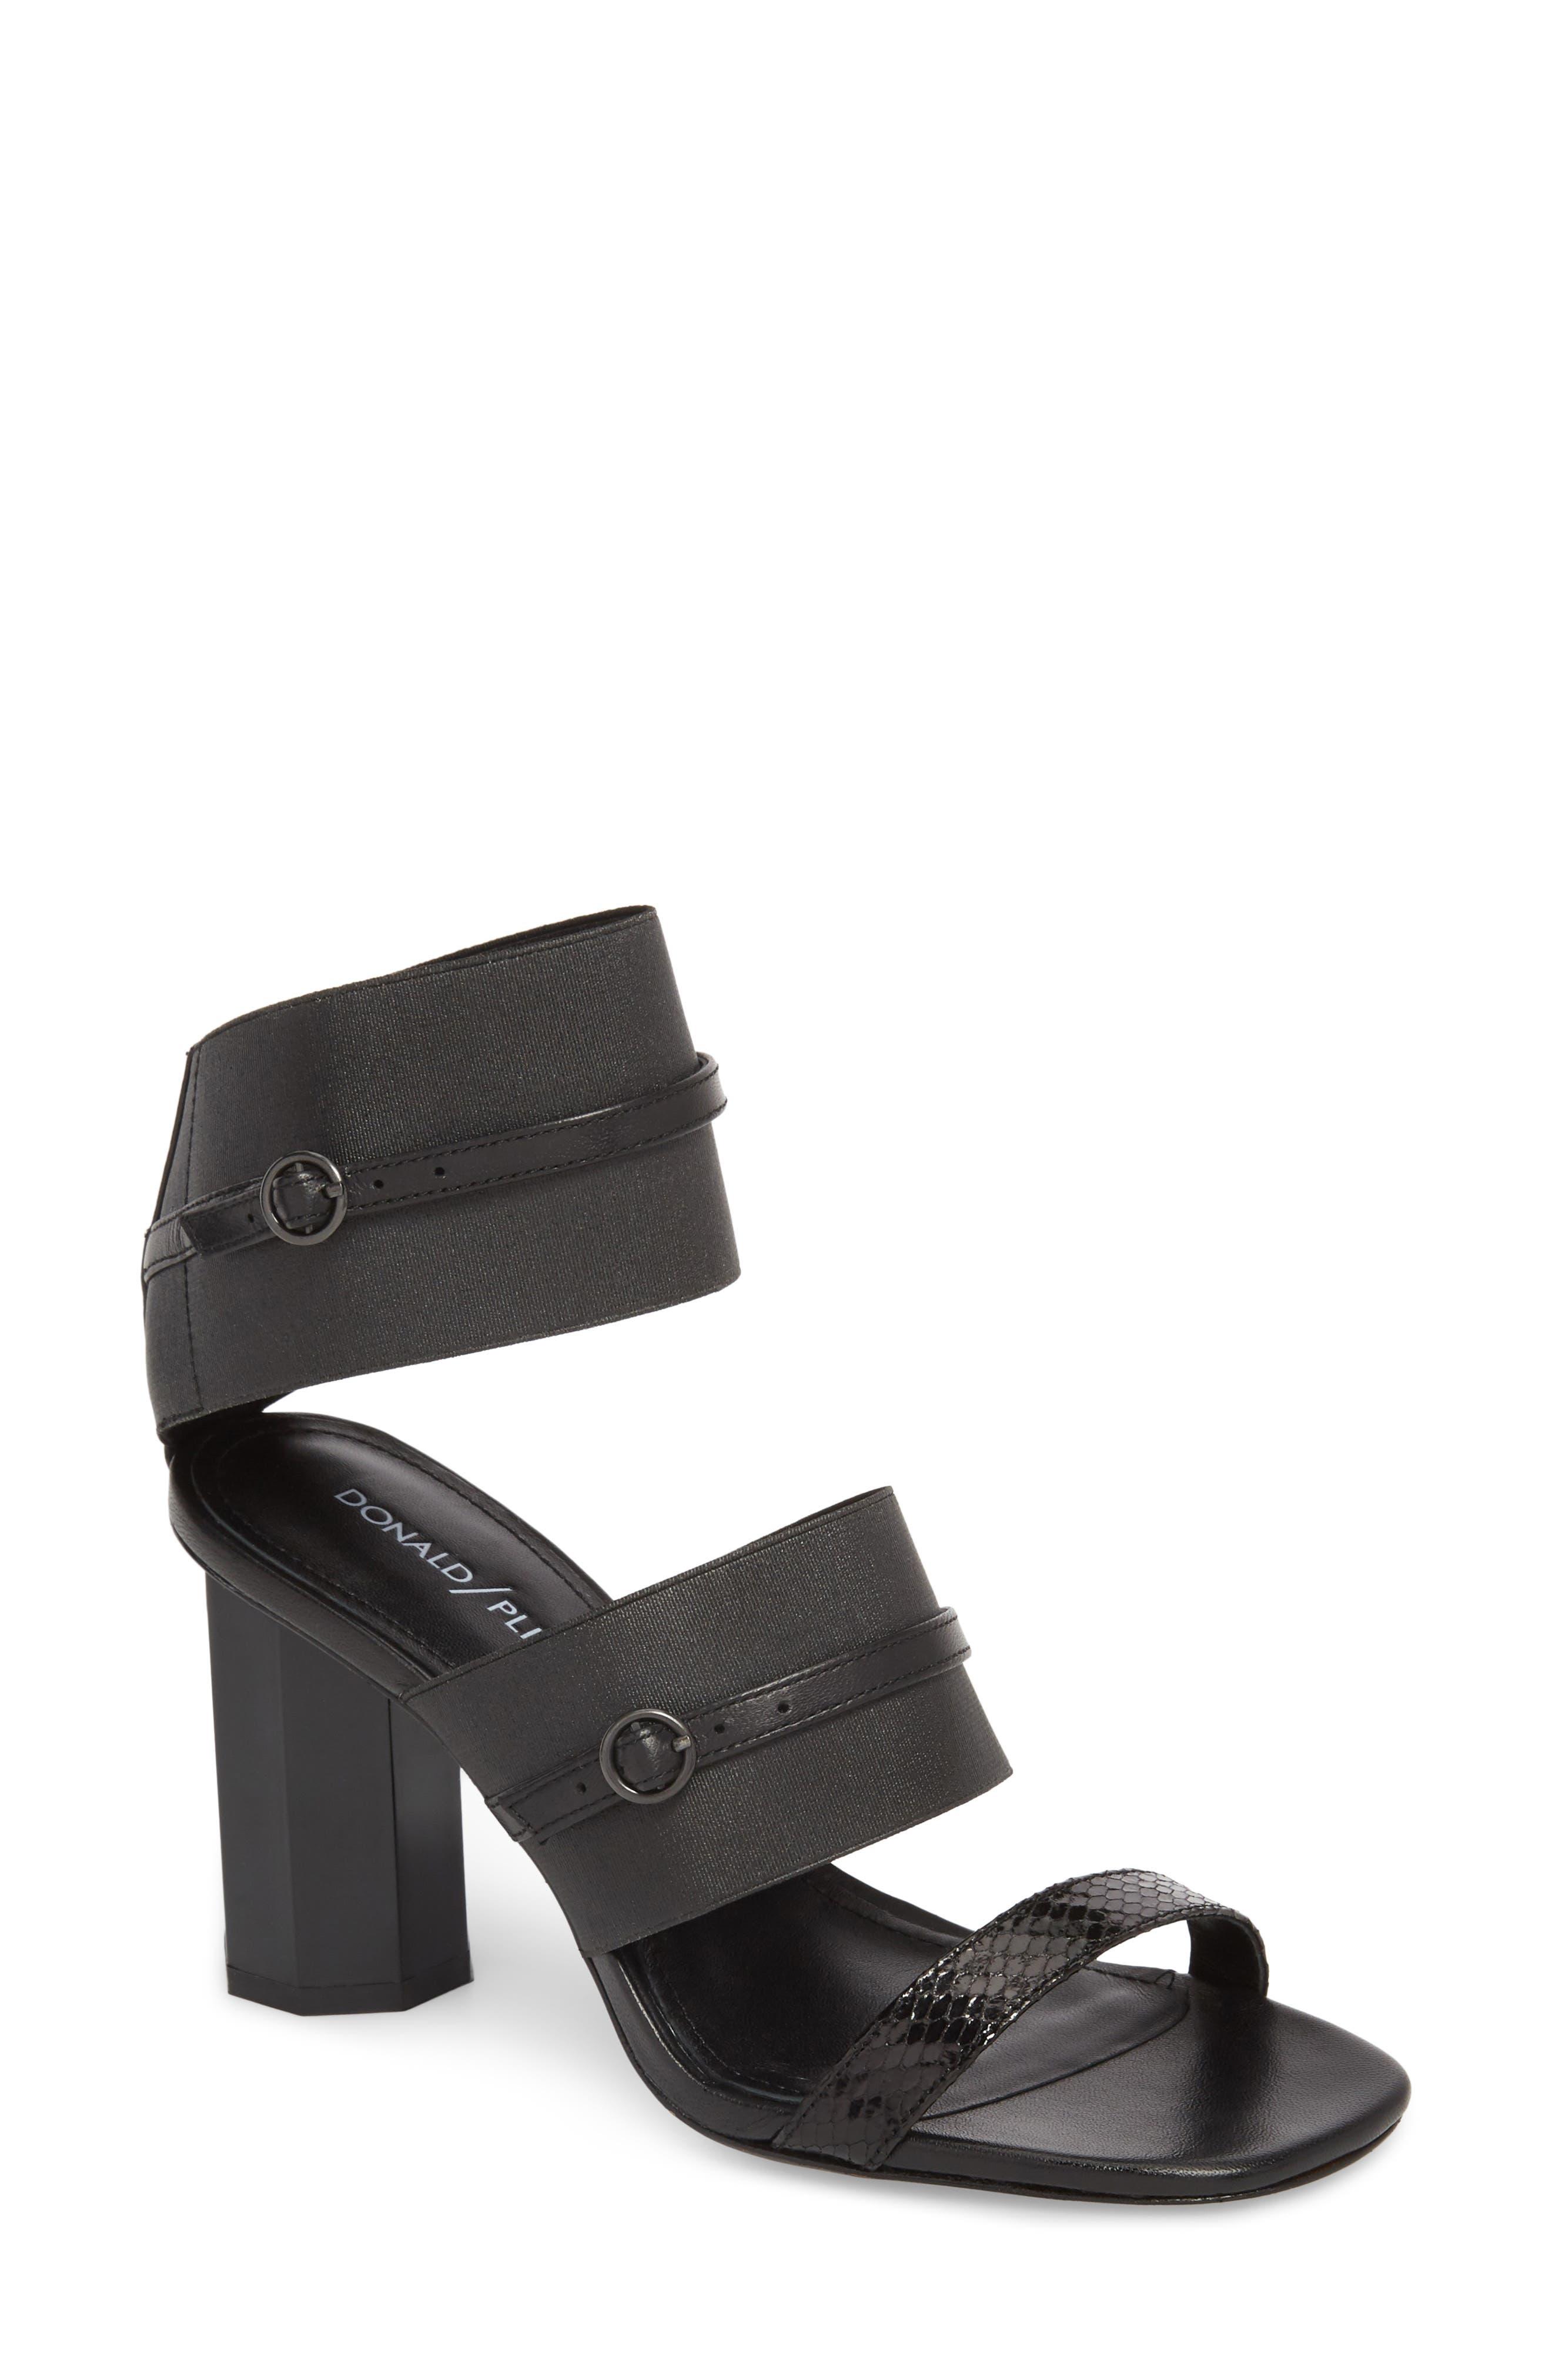 Edie Sandal,                             Main thumbnail 1, color,                             Black Leather